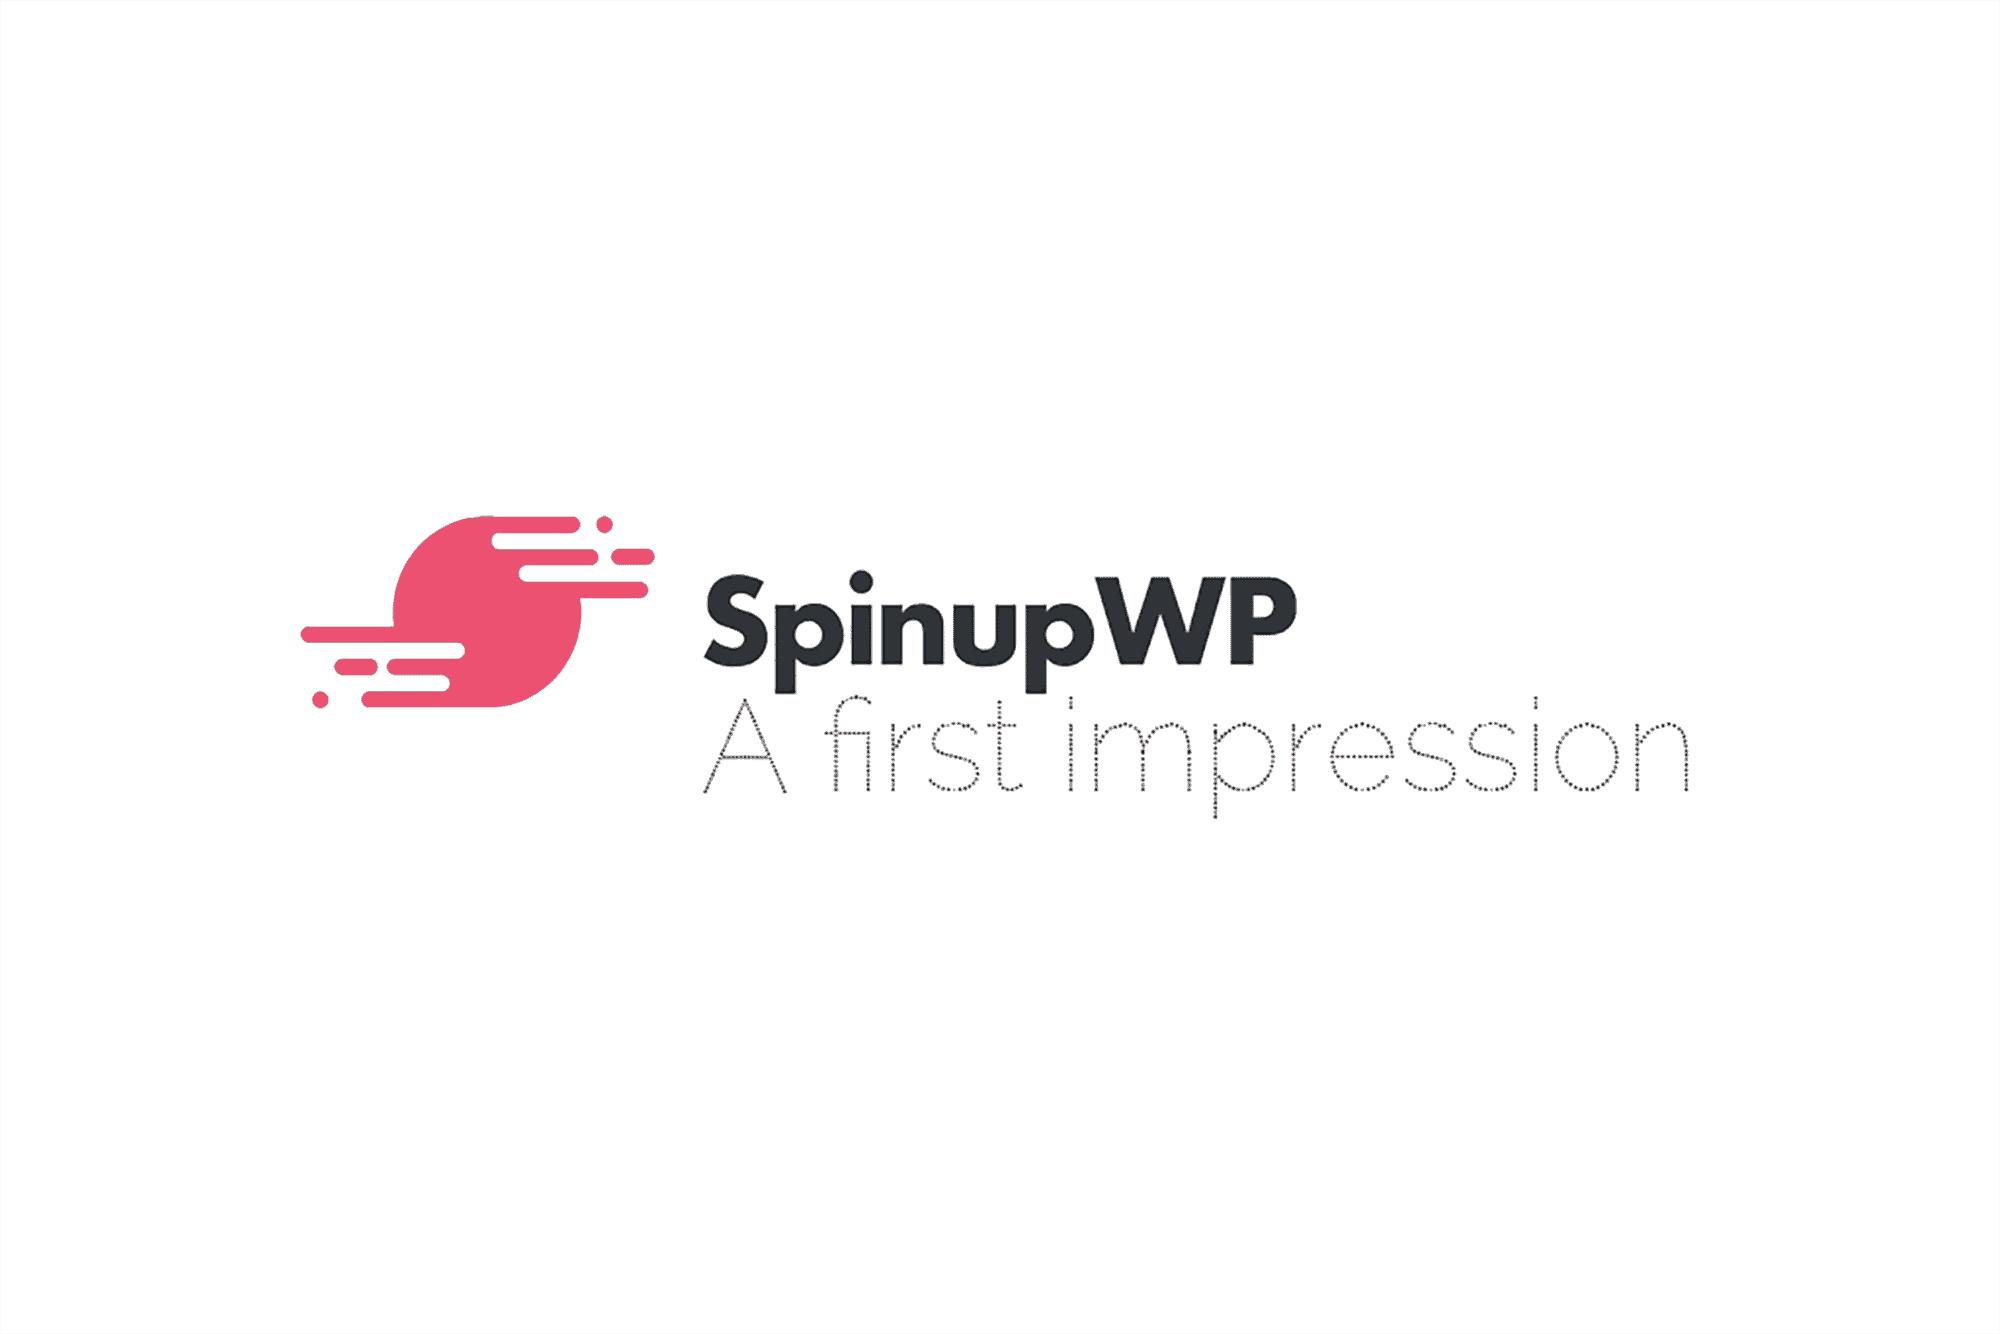 SpinupWP: A first impression